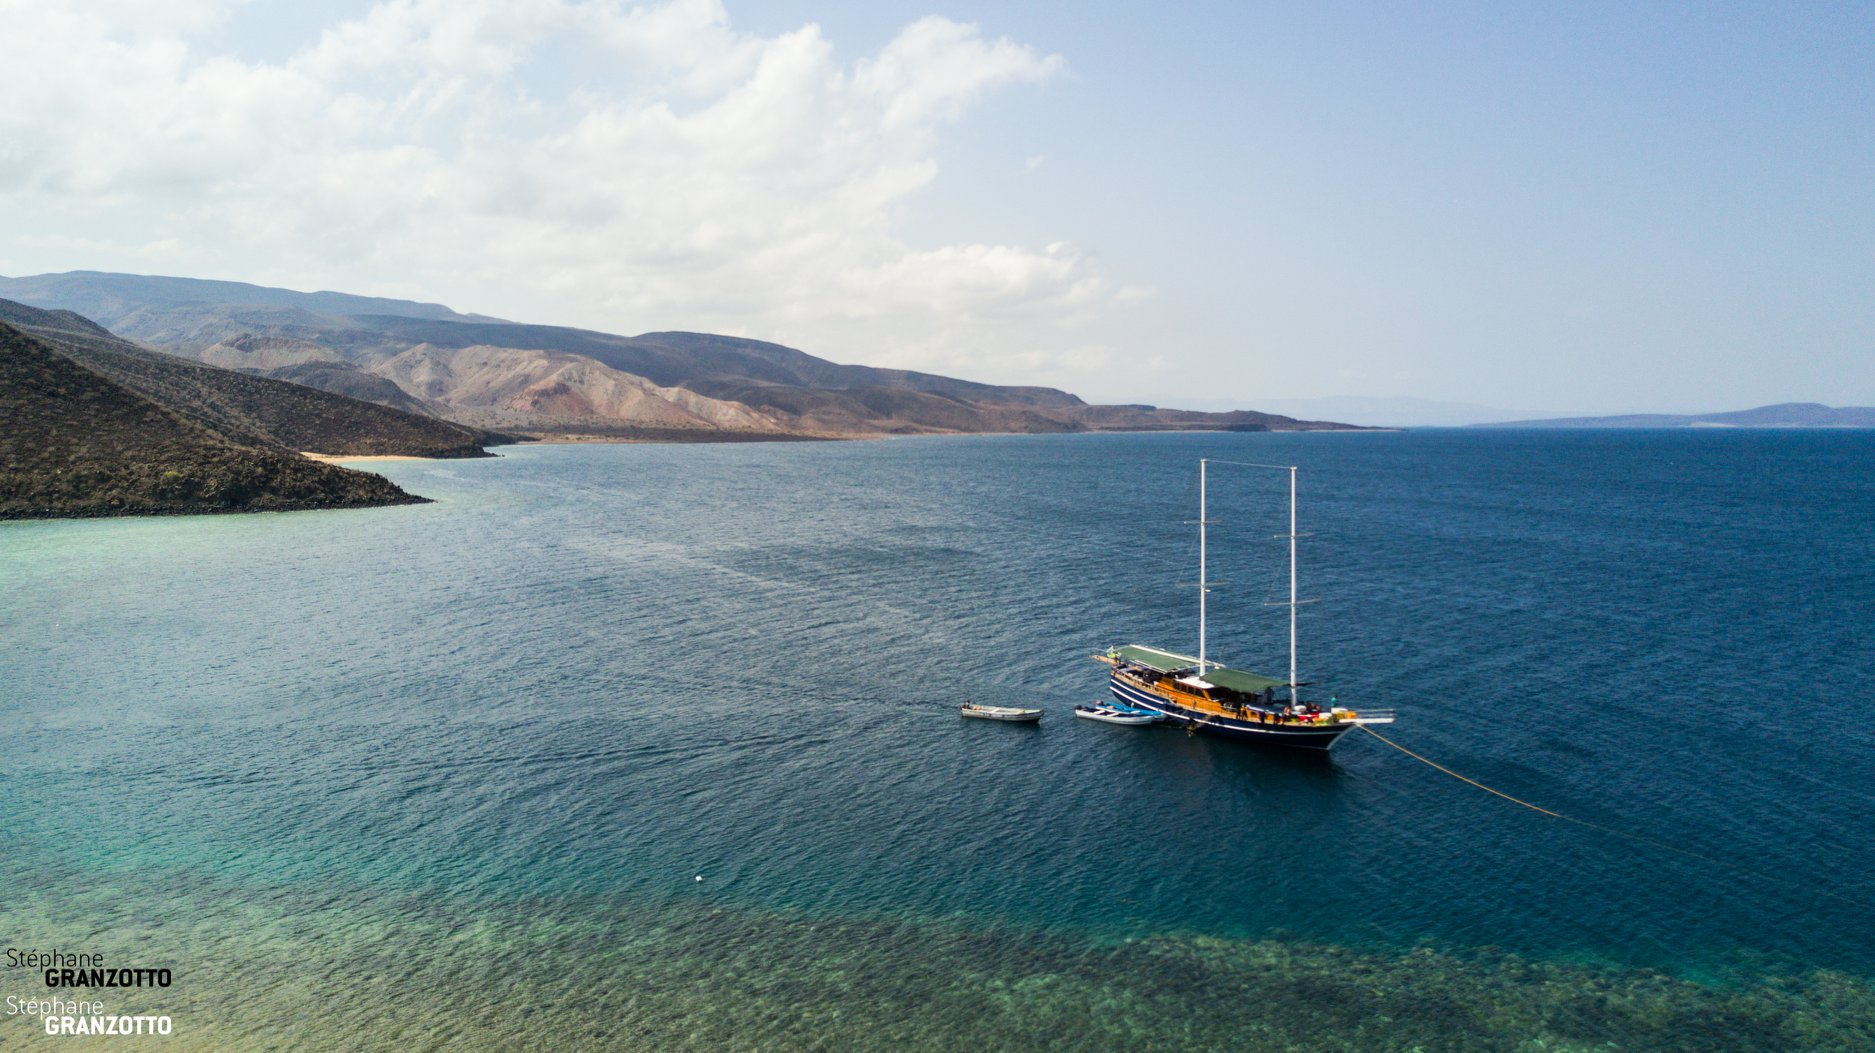 Organisation de voyages aventures plongee sous-marine